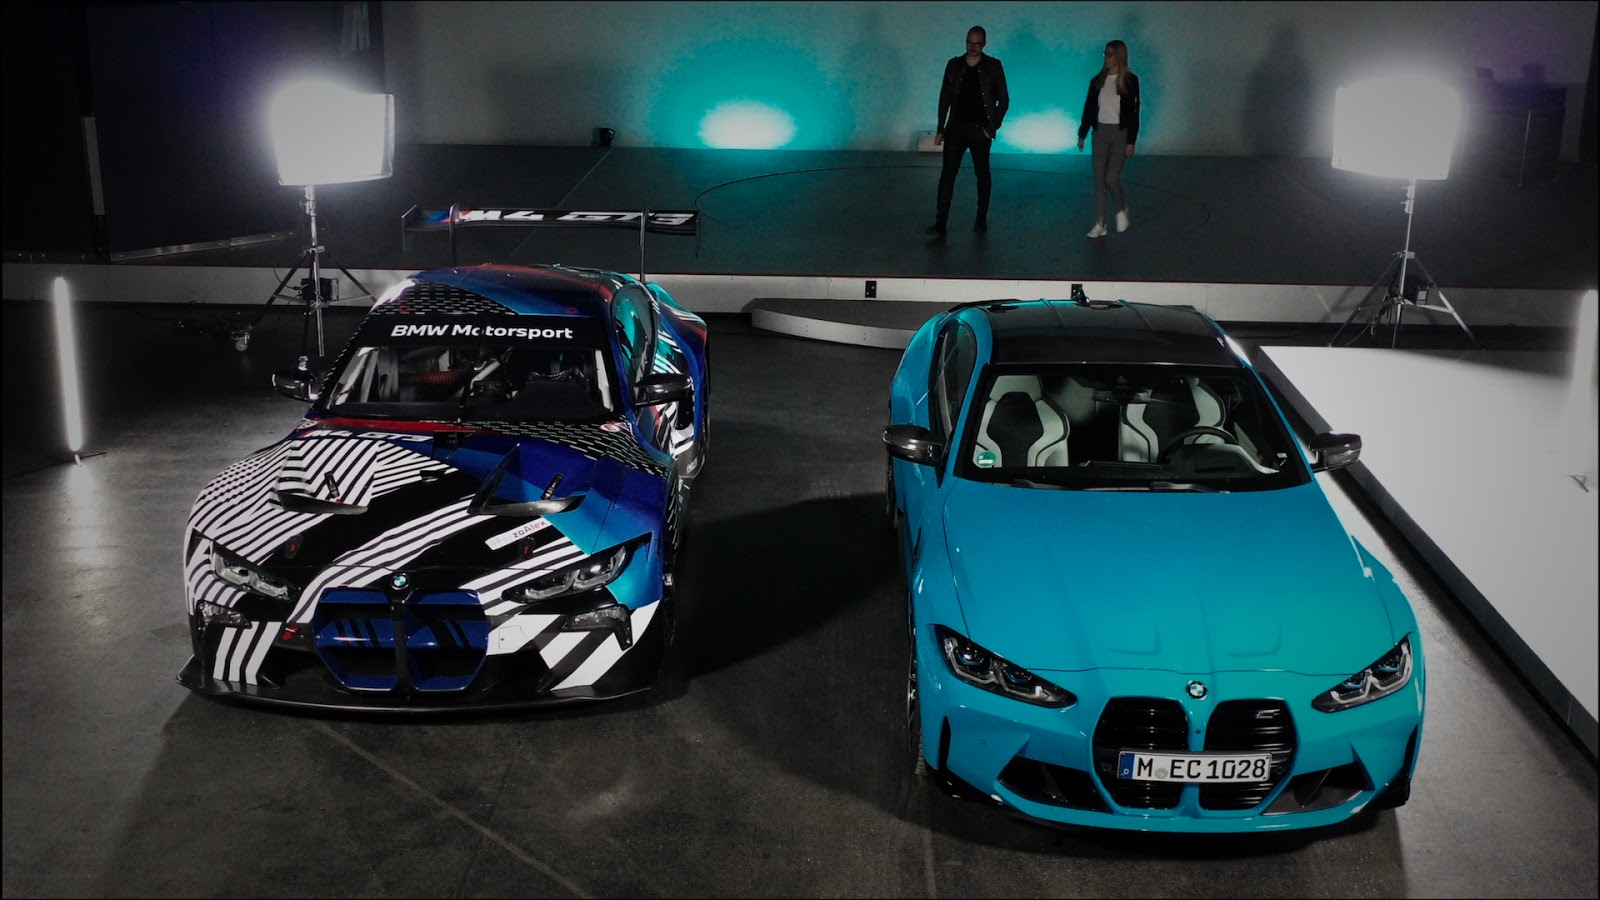 P90418591 highRes the bmw m4 meets the 1 Περί κινητήρων BMW M : Η M4 συναντά την M4 GT3 (video) BMW, BMW M, BMW M Performance, BMW M4, M, M4, ειδήσεις